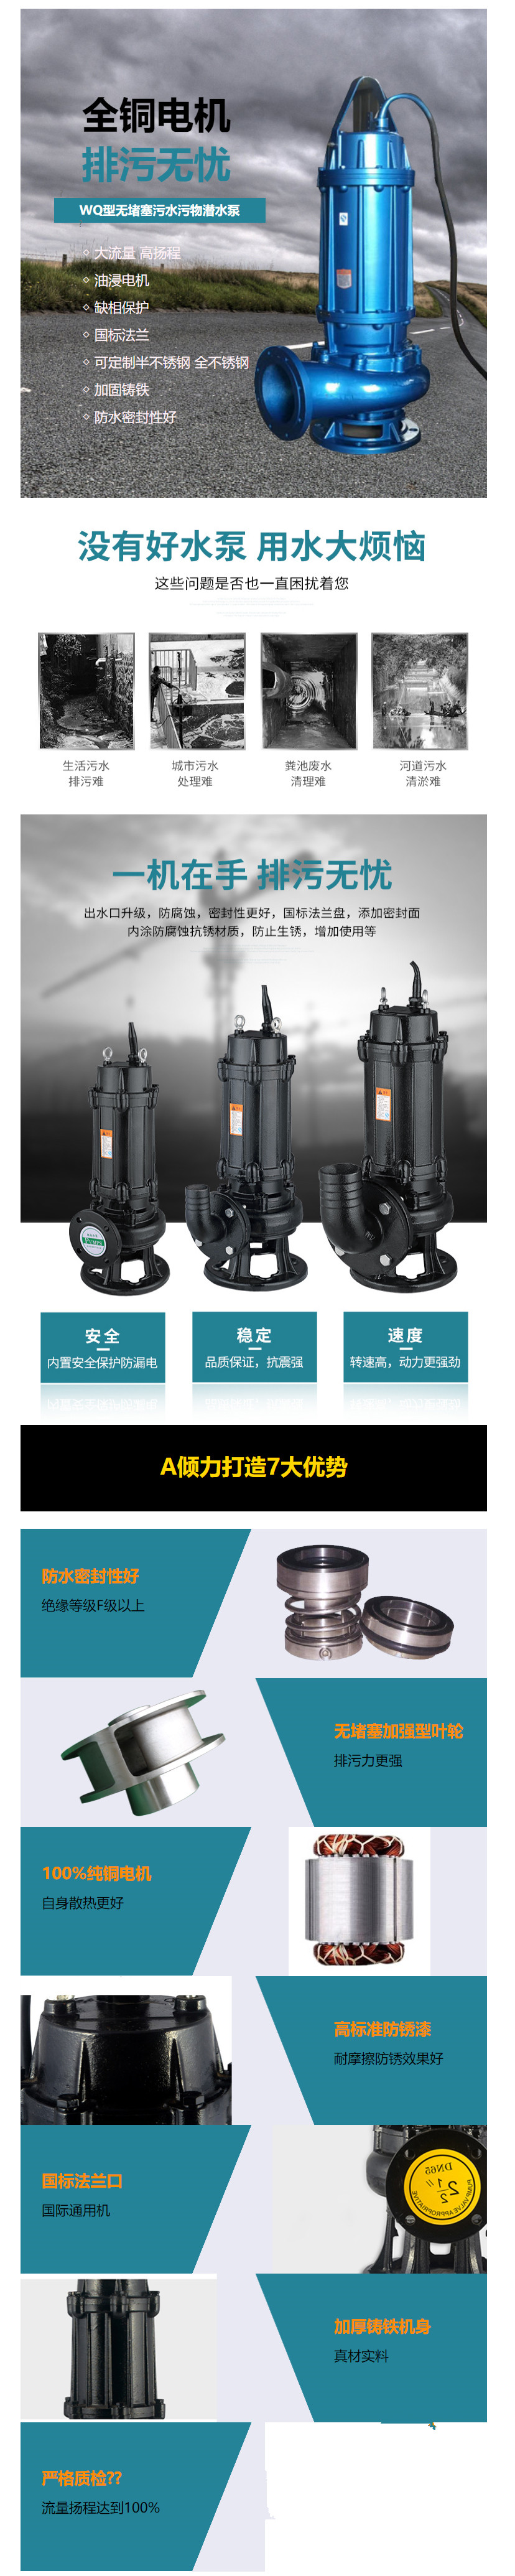 WQ型污水泵01_副本.jpg